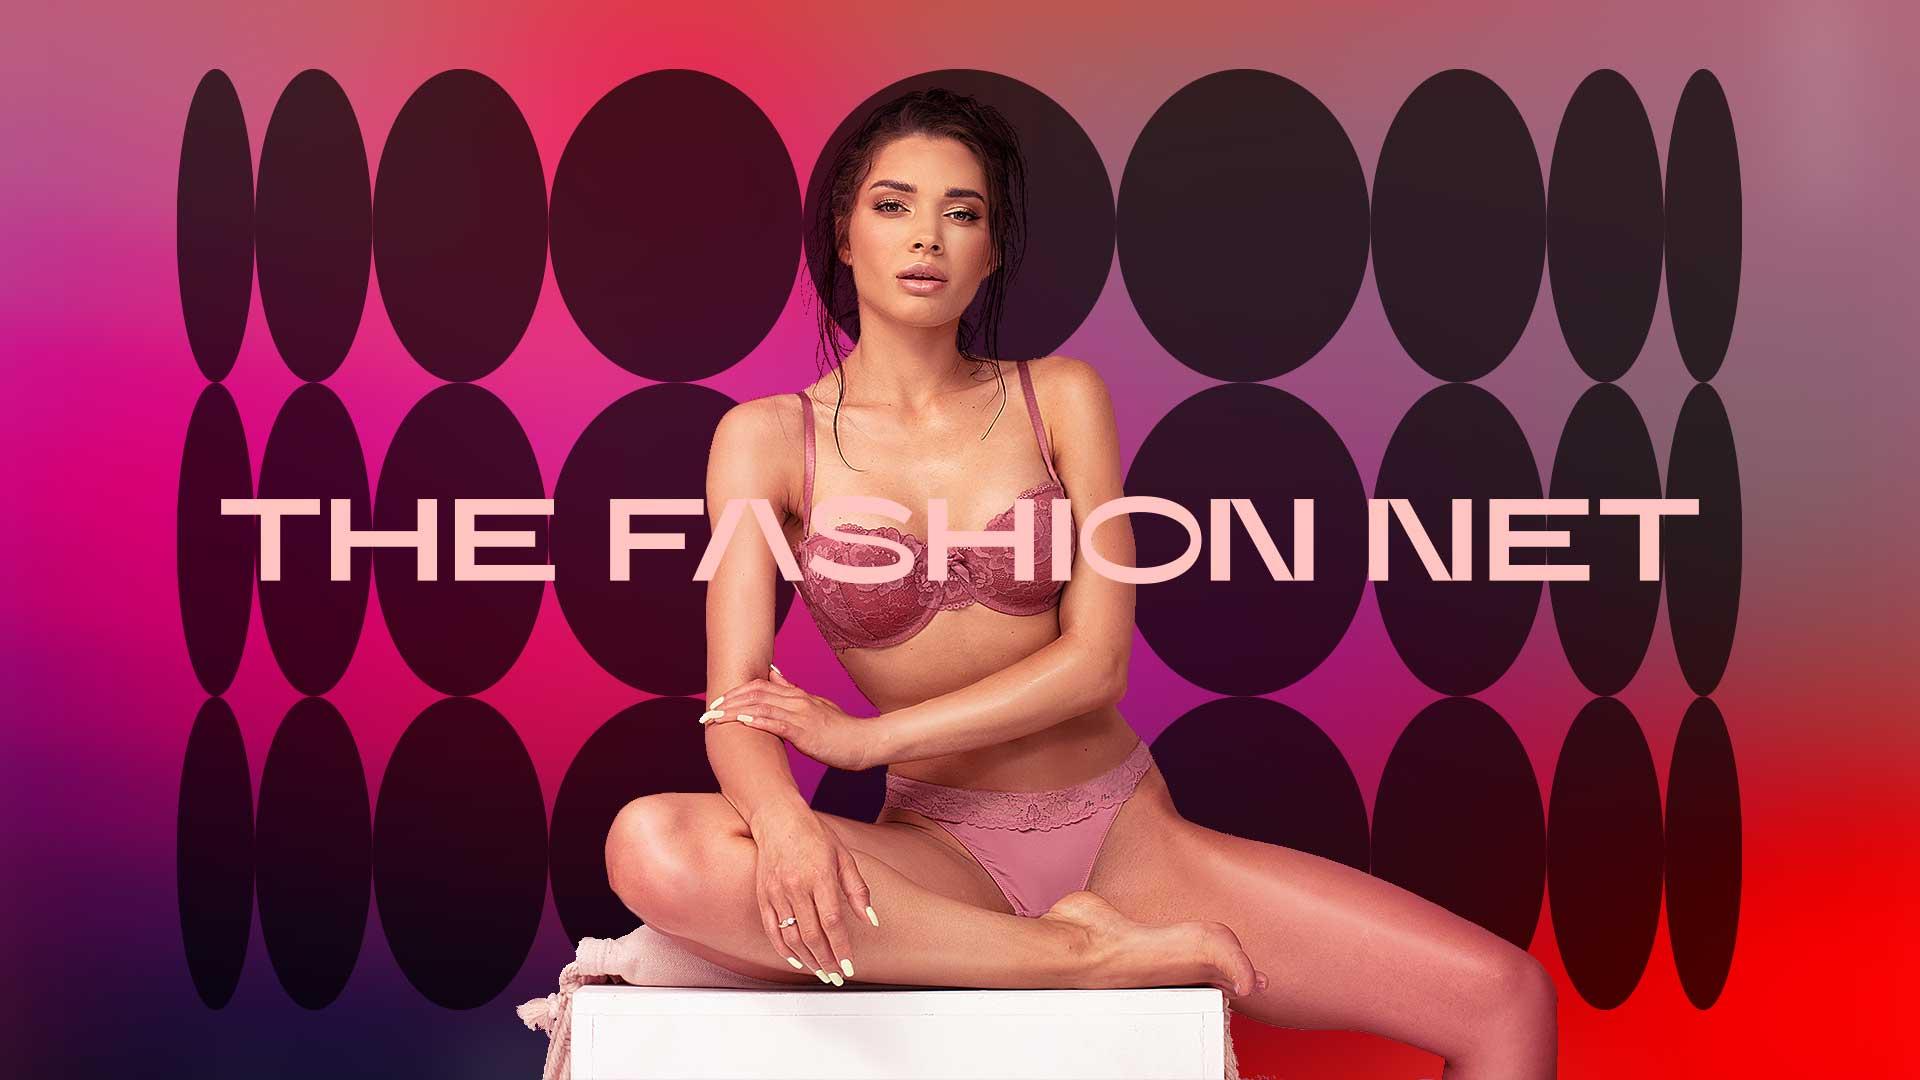 The Fashion Net